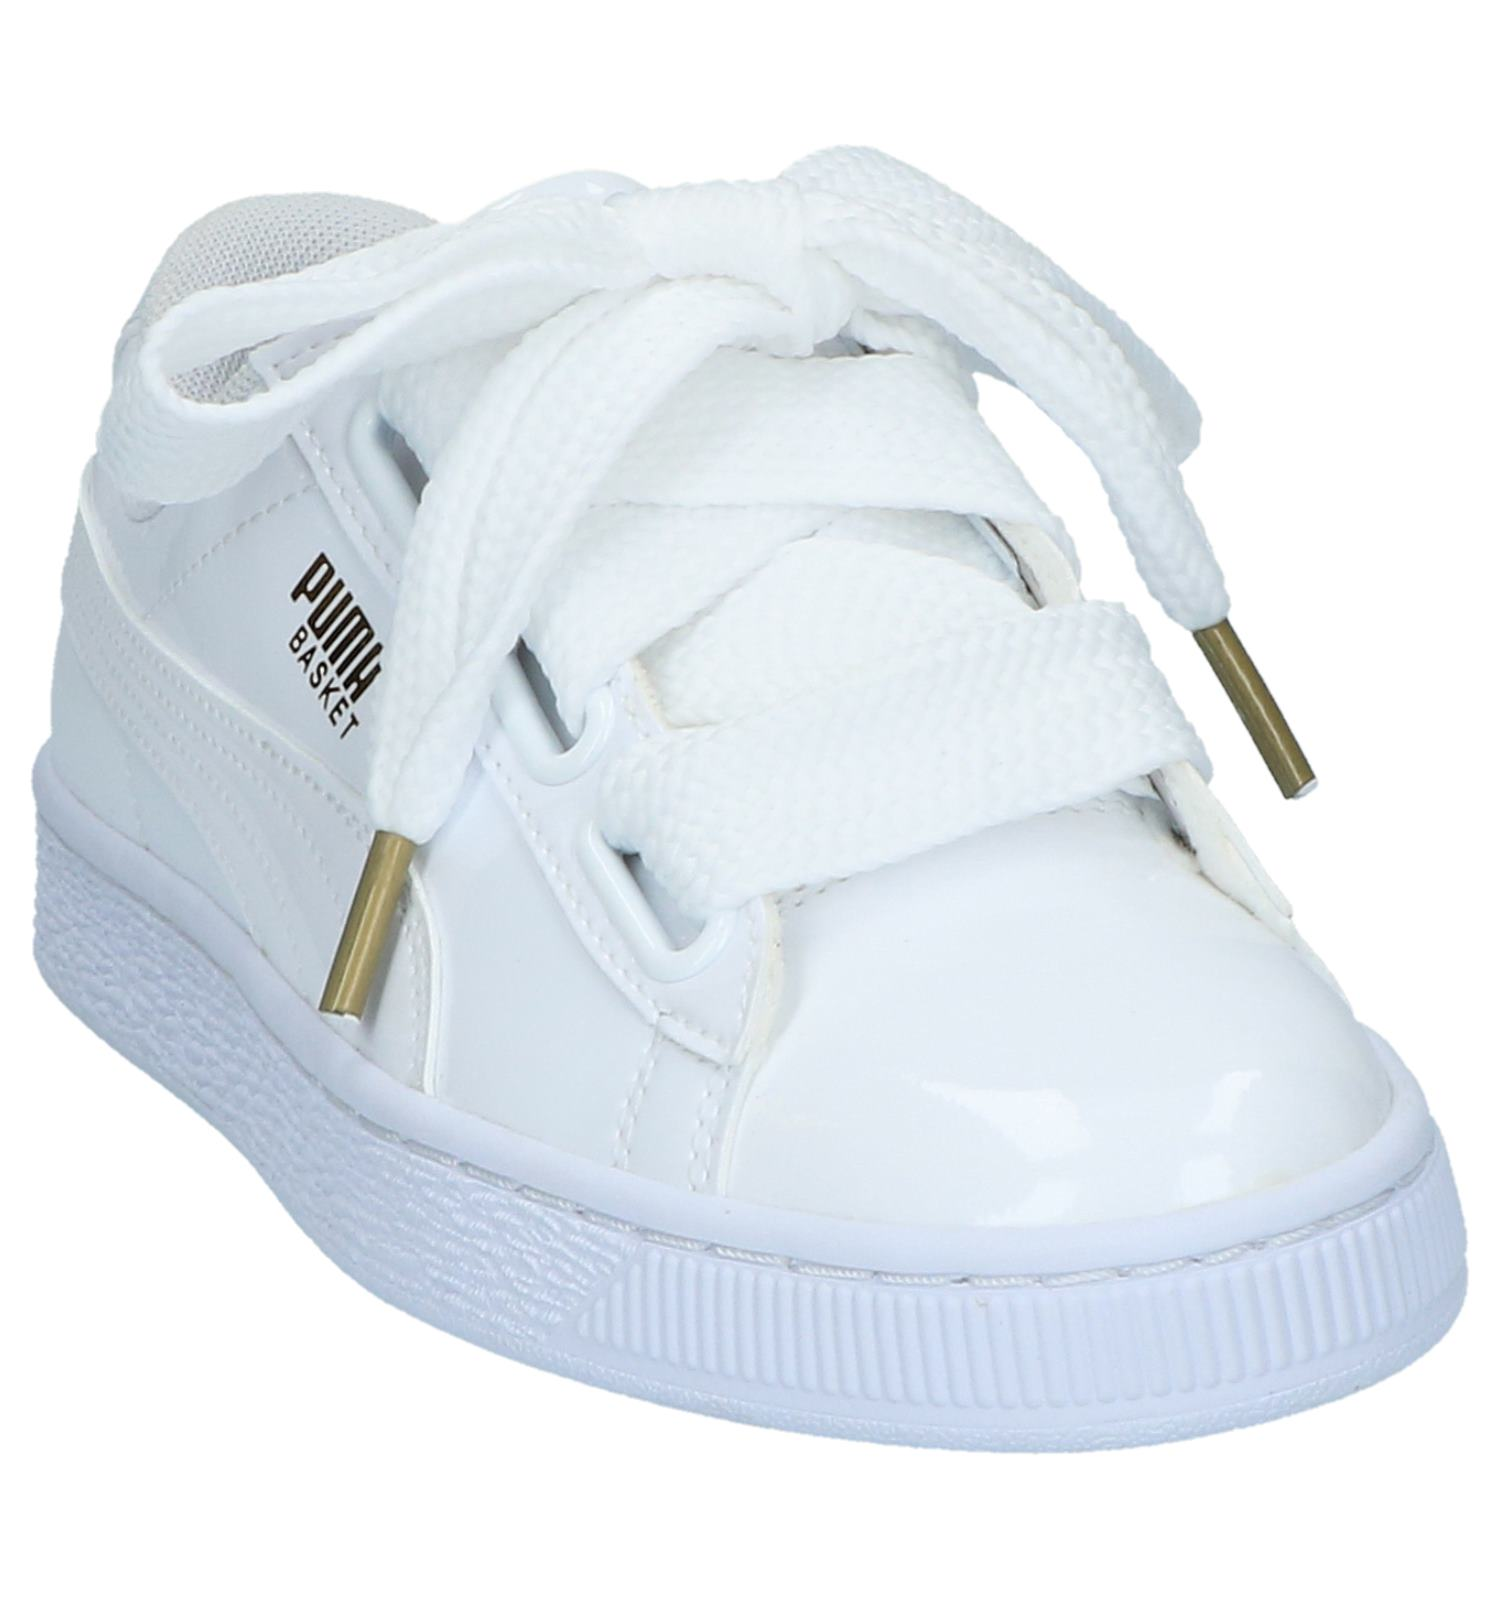 f4bad9fbd80 Gratis retour Basket TORFS Patent Sneakers Puma en Sportieve Lage BE  verzend Heart Witte z7SqwTx